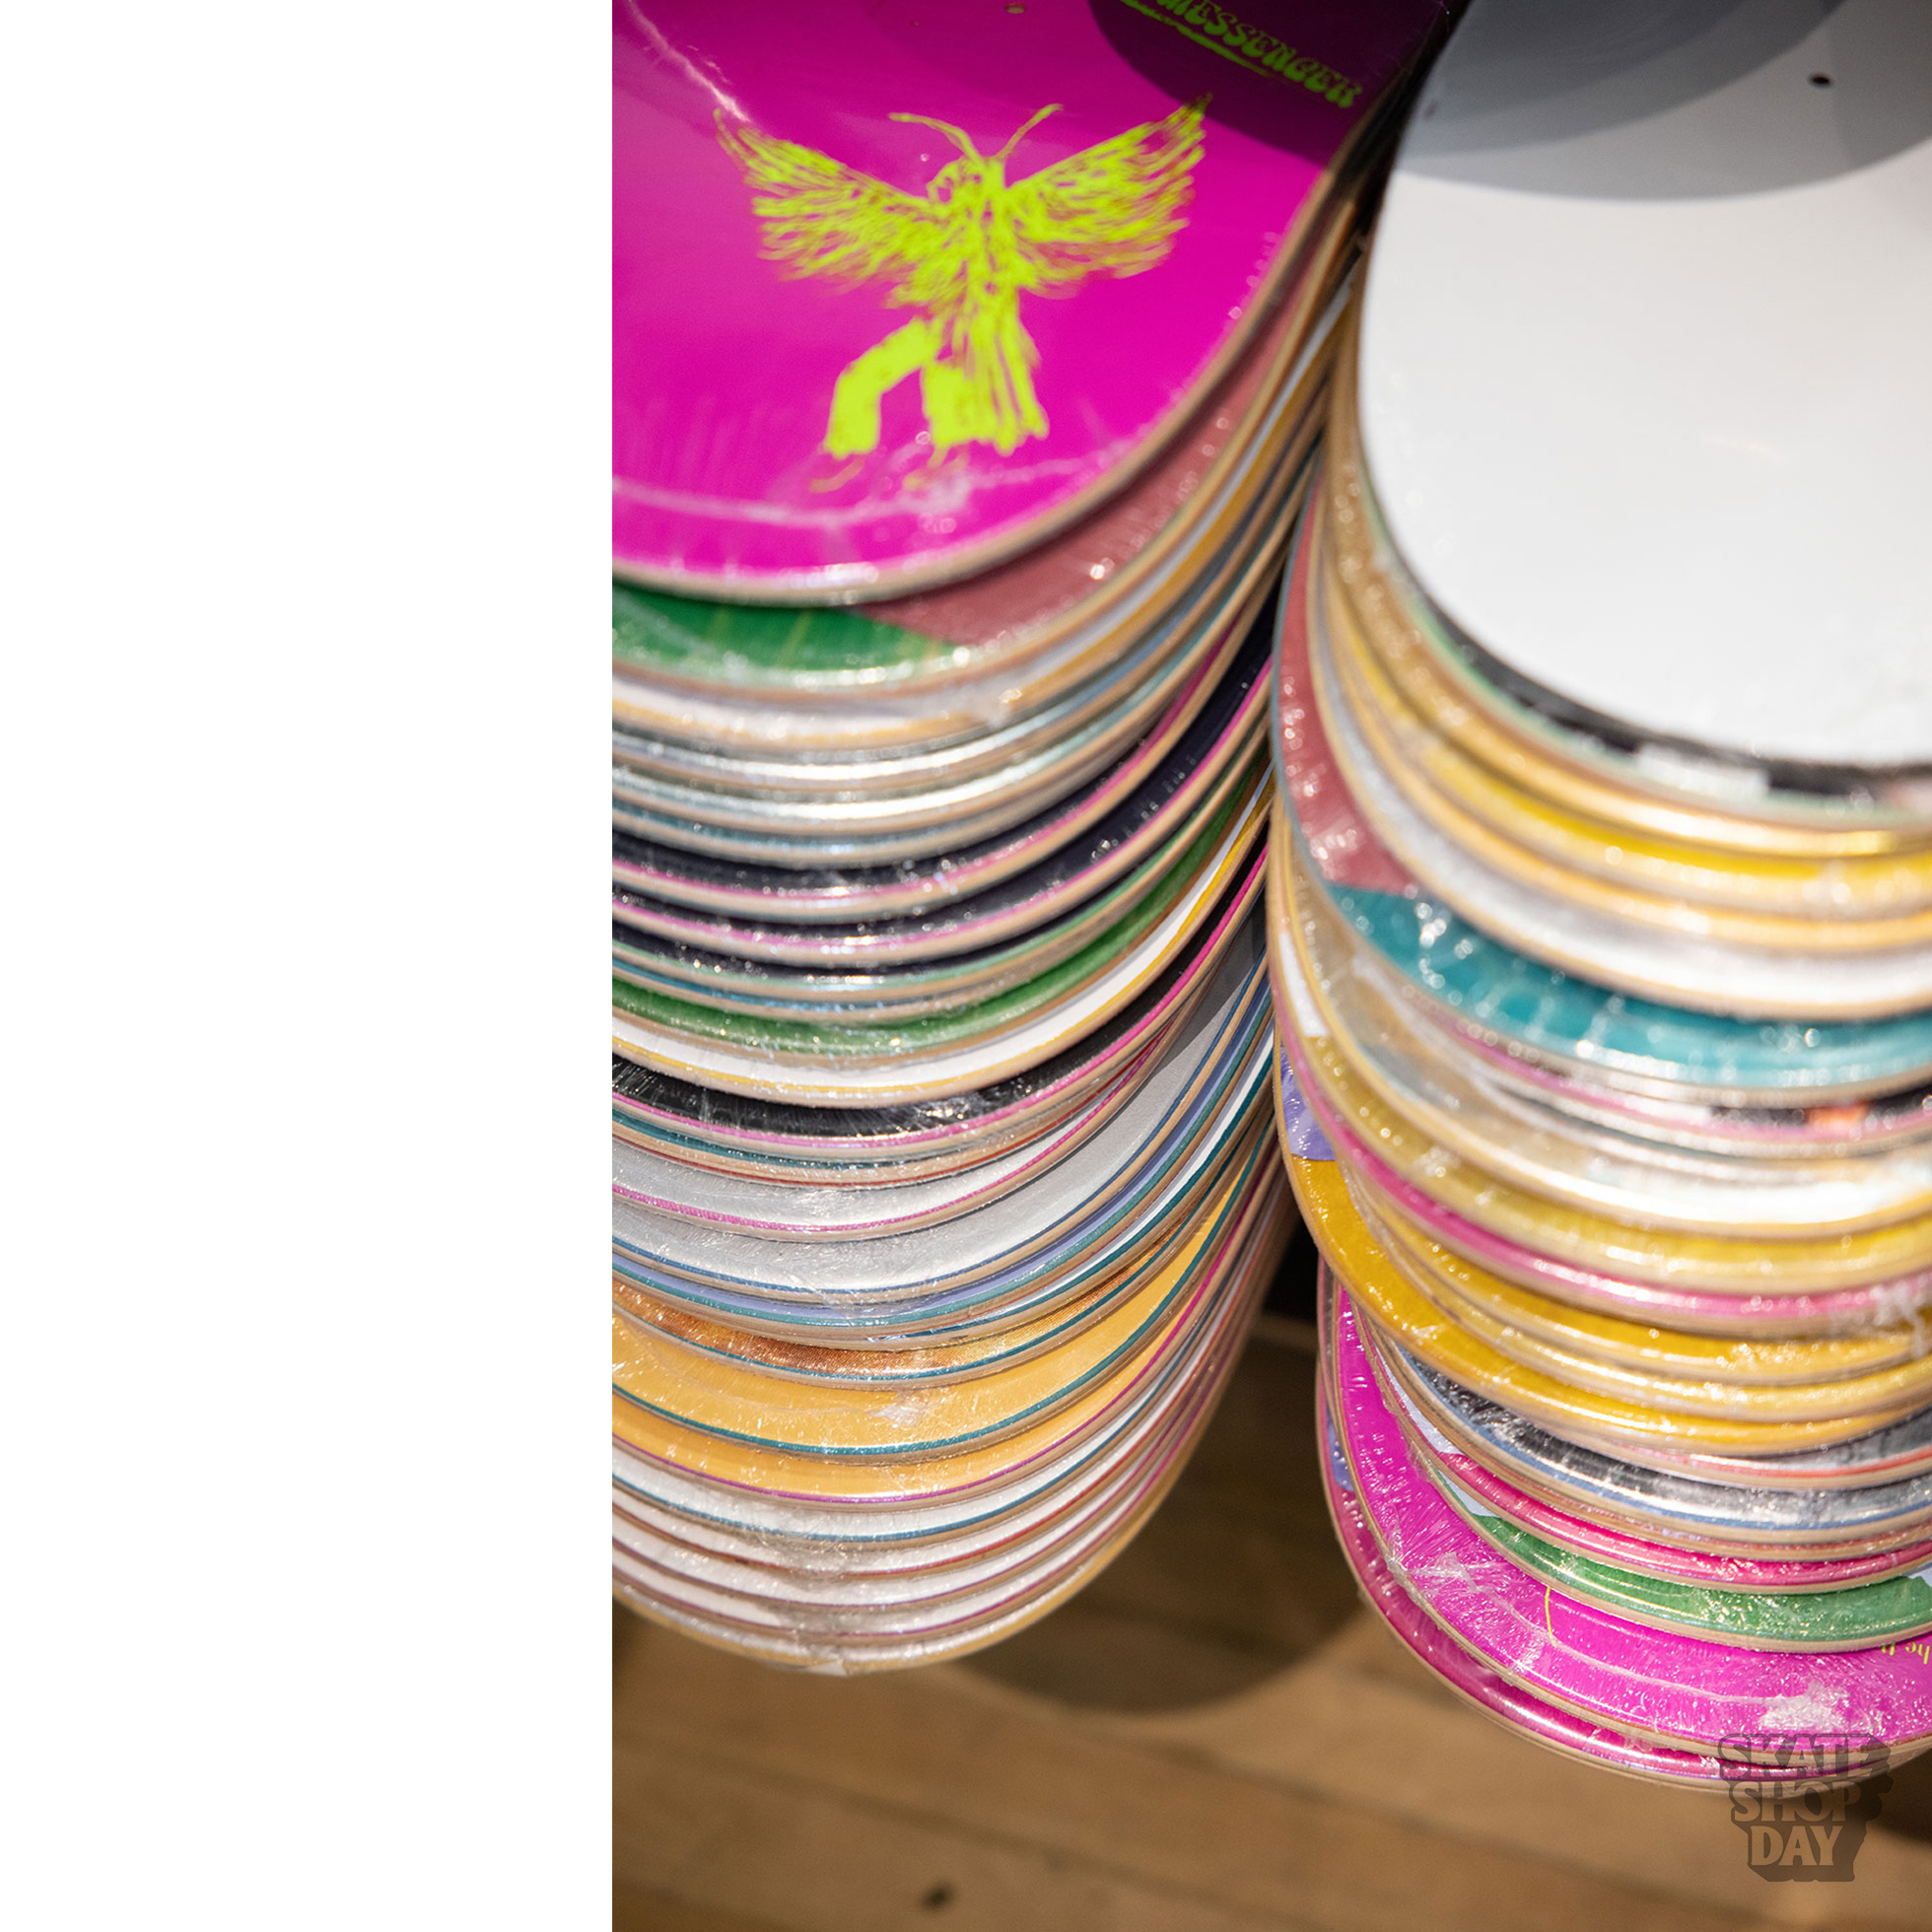 Skate Shop Day: Tiki Room & Working Class - decks